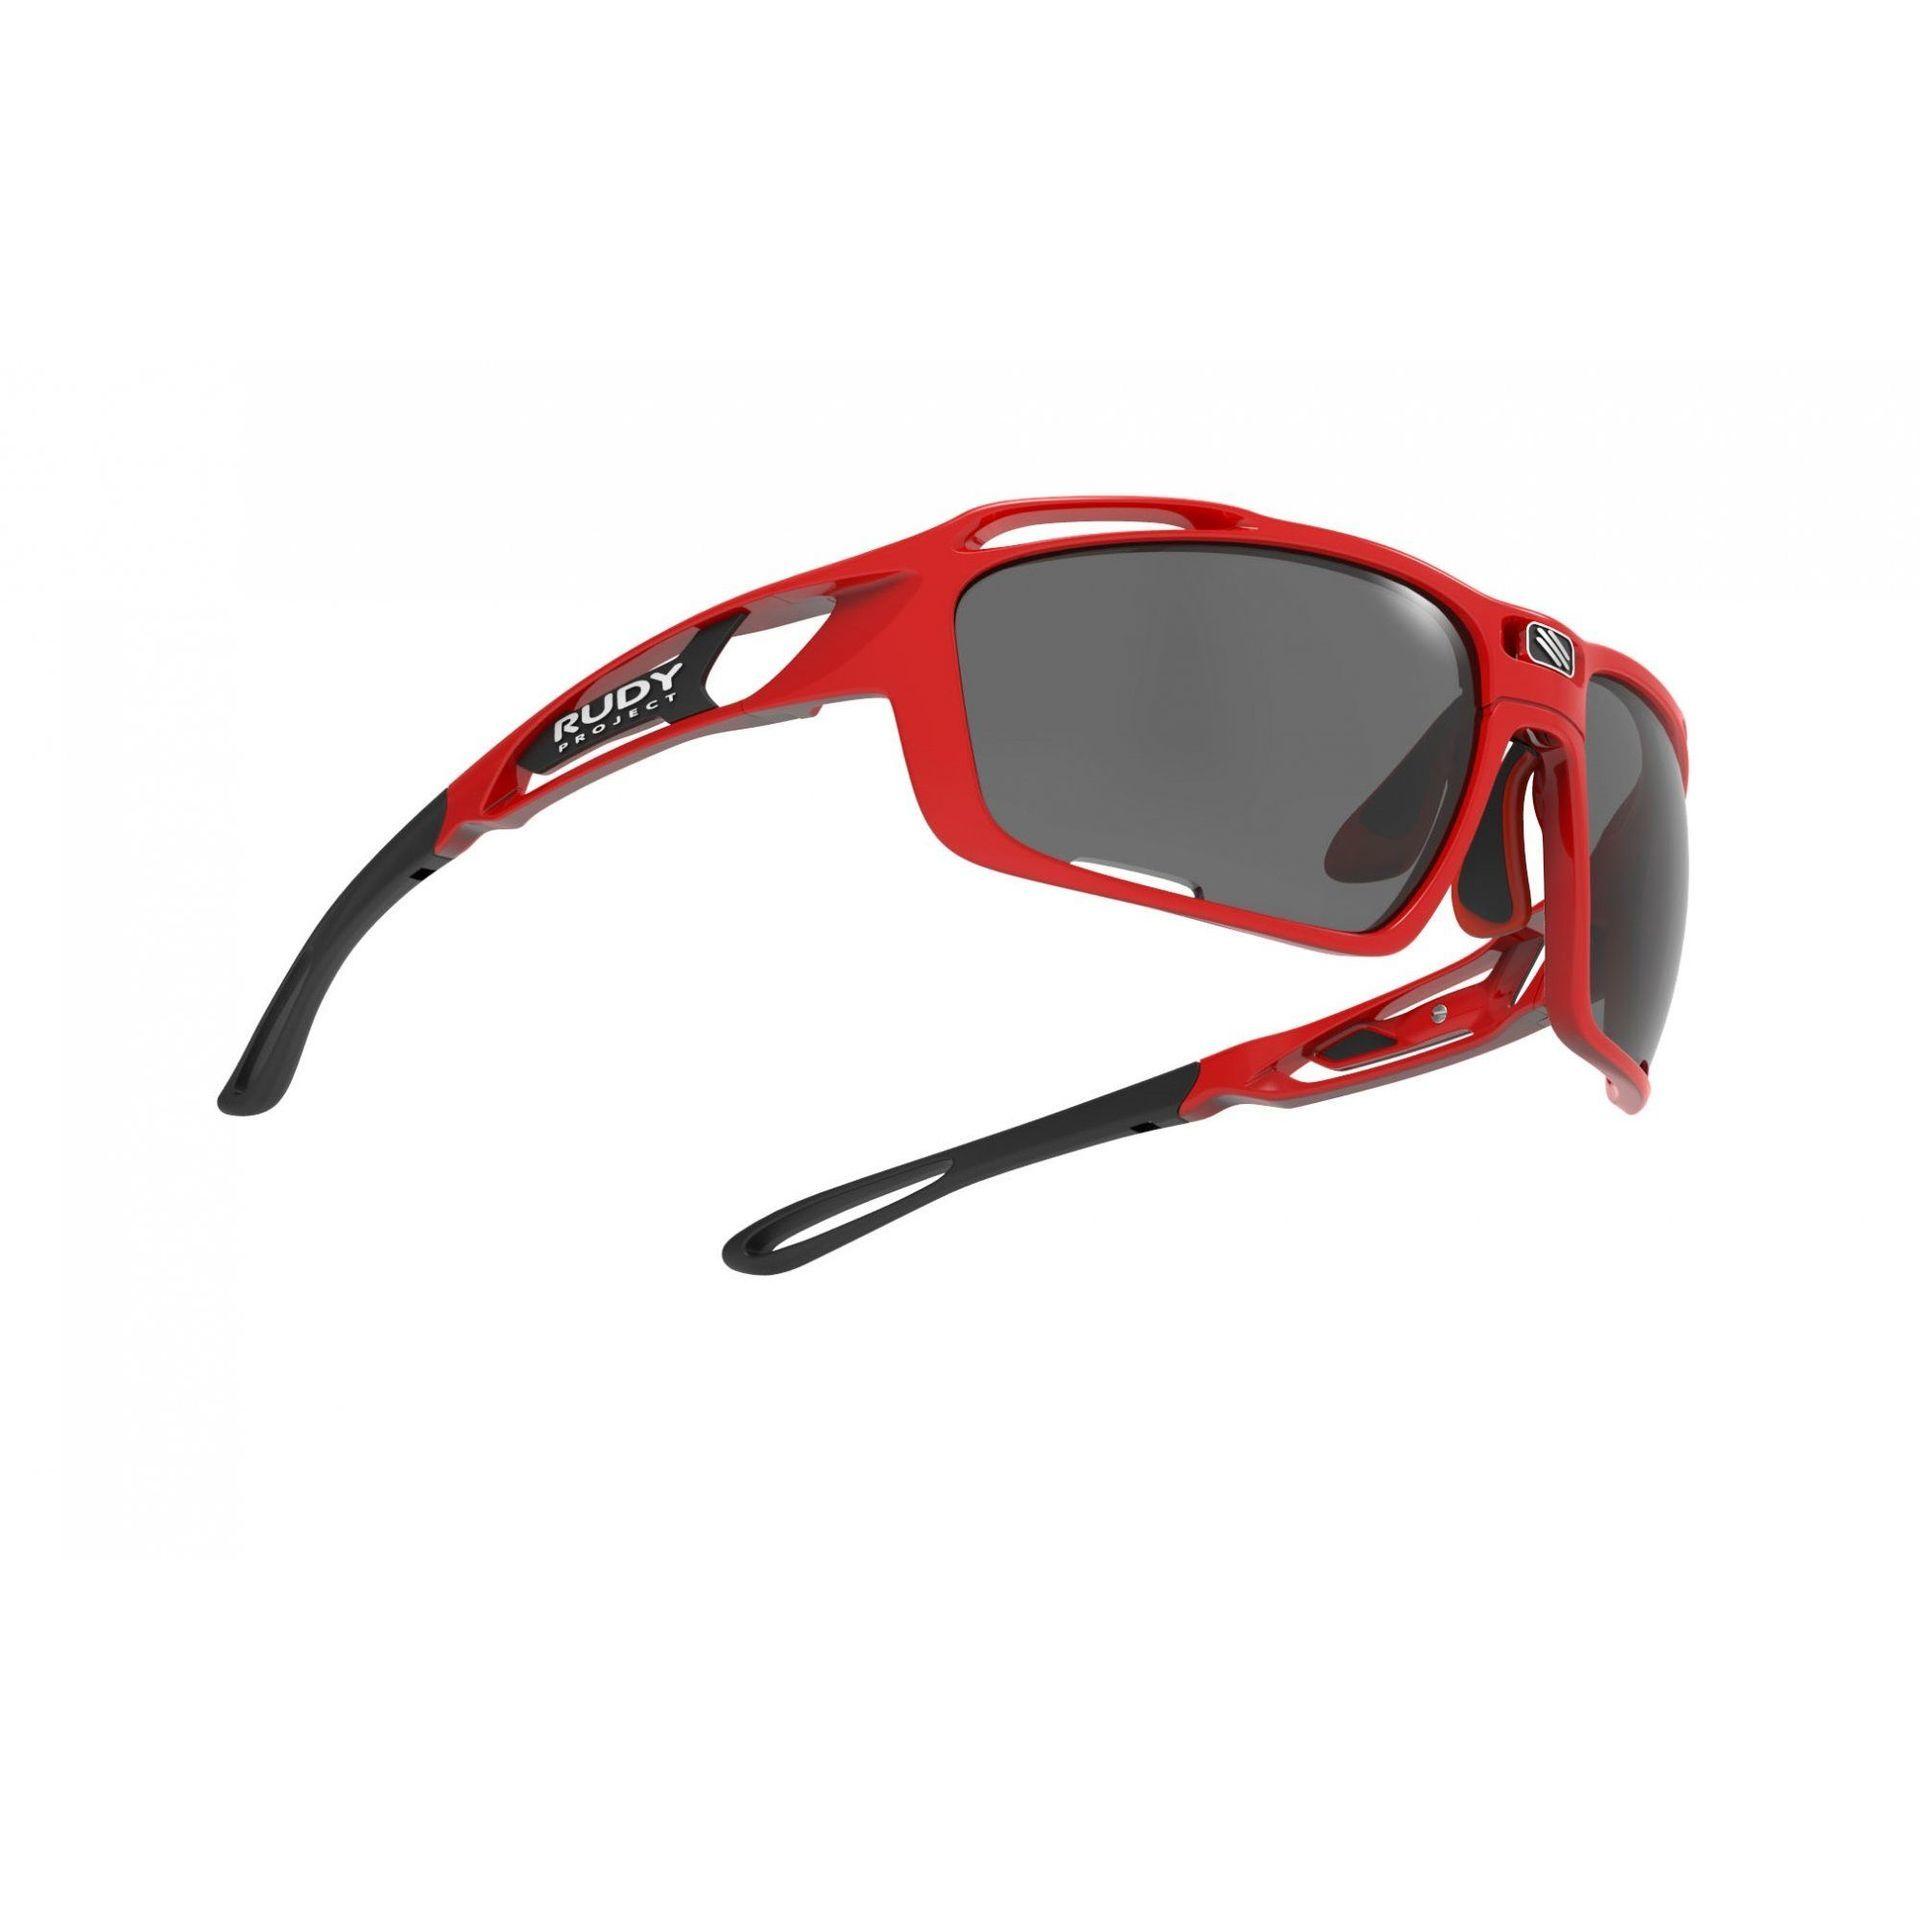 OKULARY RUDY PROJECT SINTRYX FIRE RED + SMOKE|TRANS SP491045 3